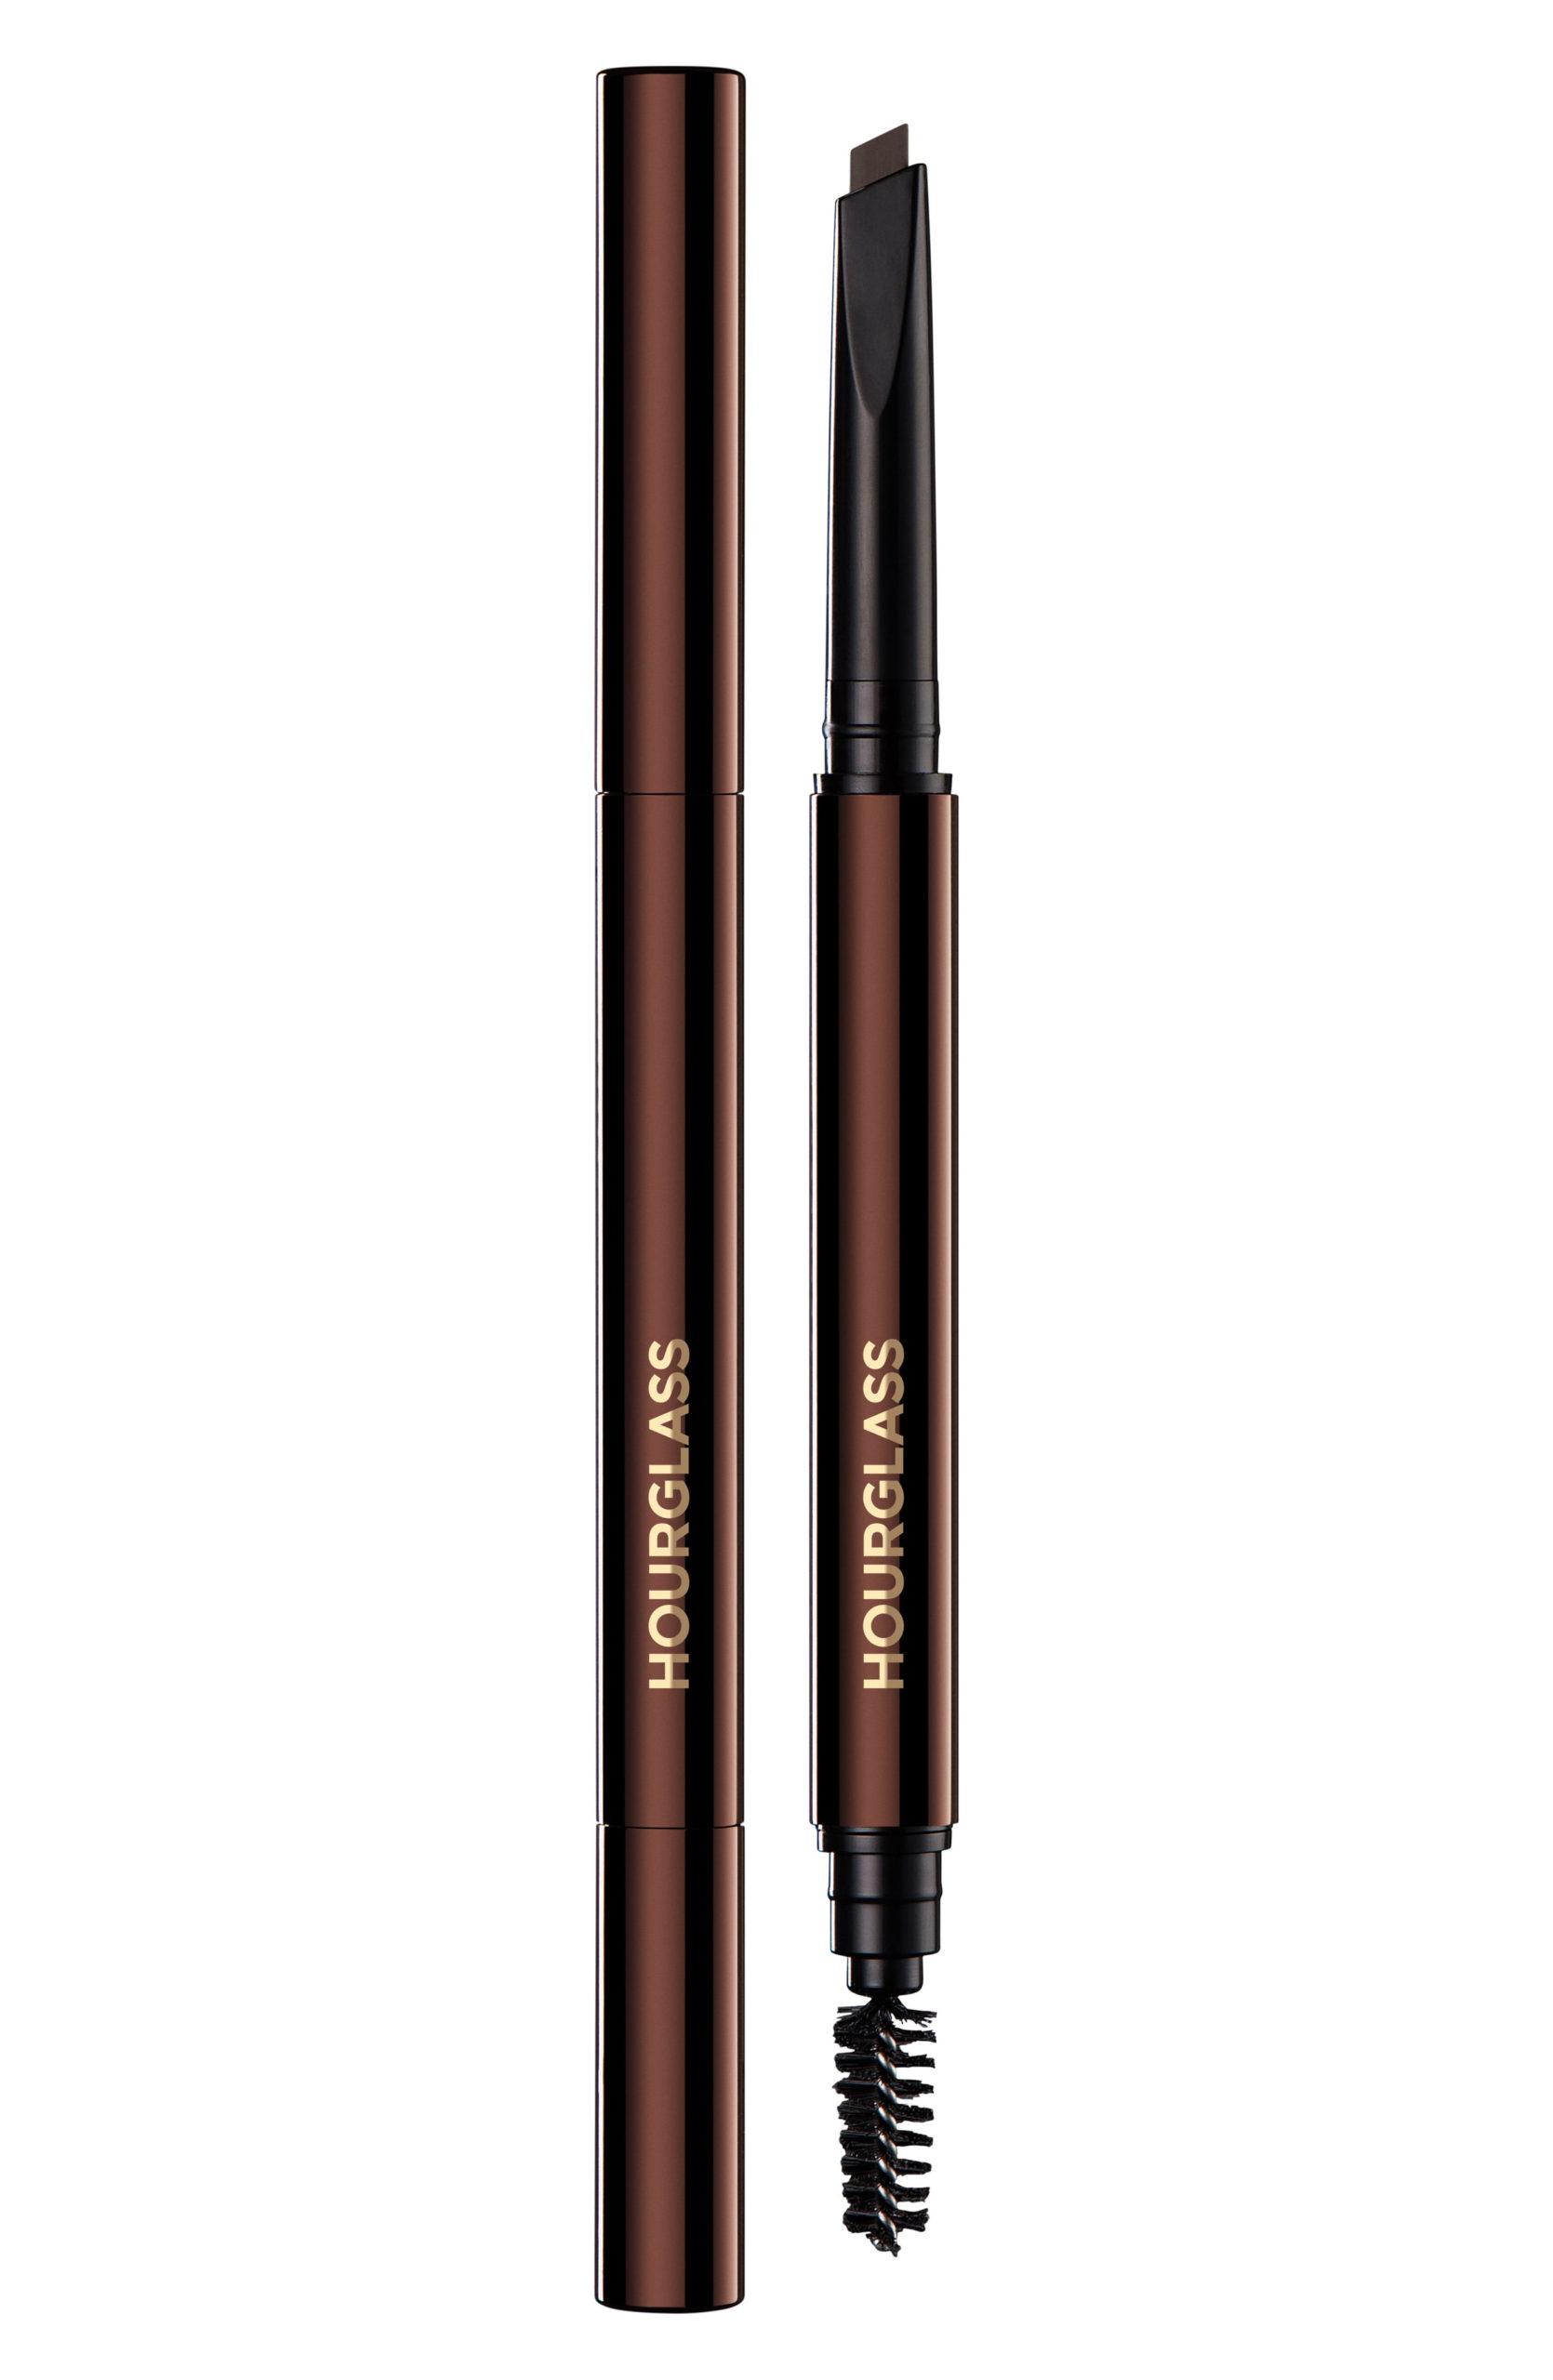 Arch Brow Sculpting Pencil - Dark Brunette